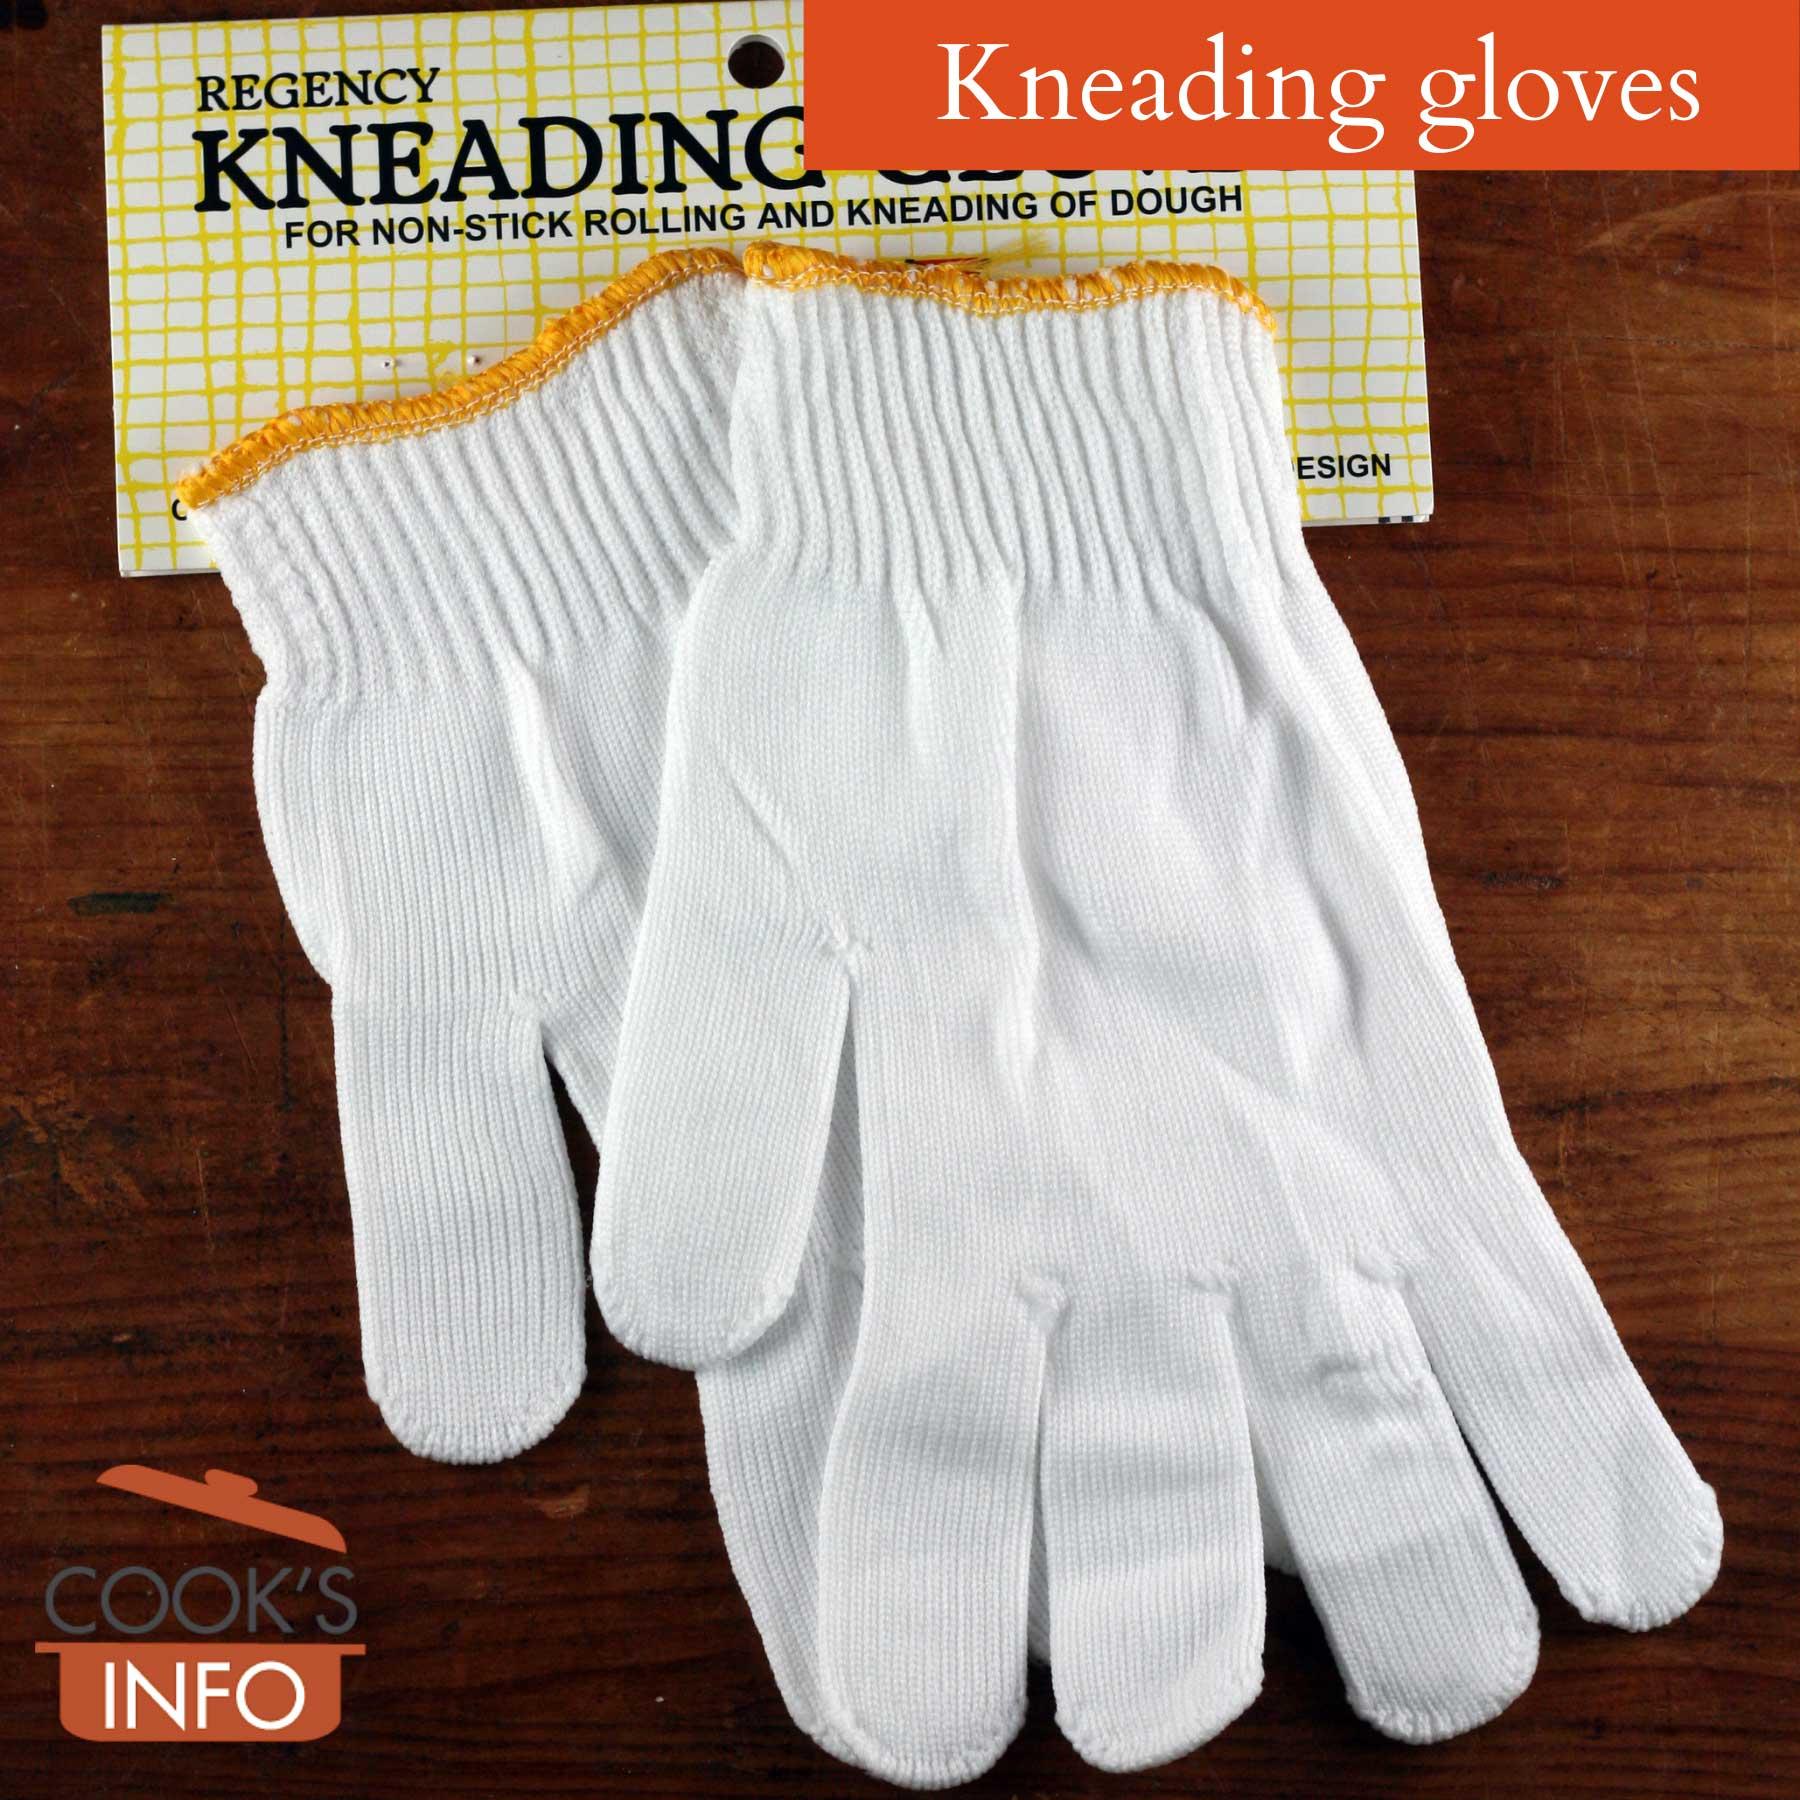 Kneading gloves